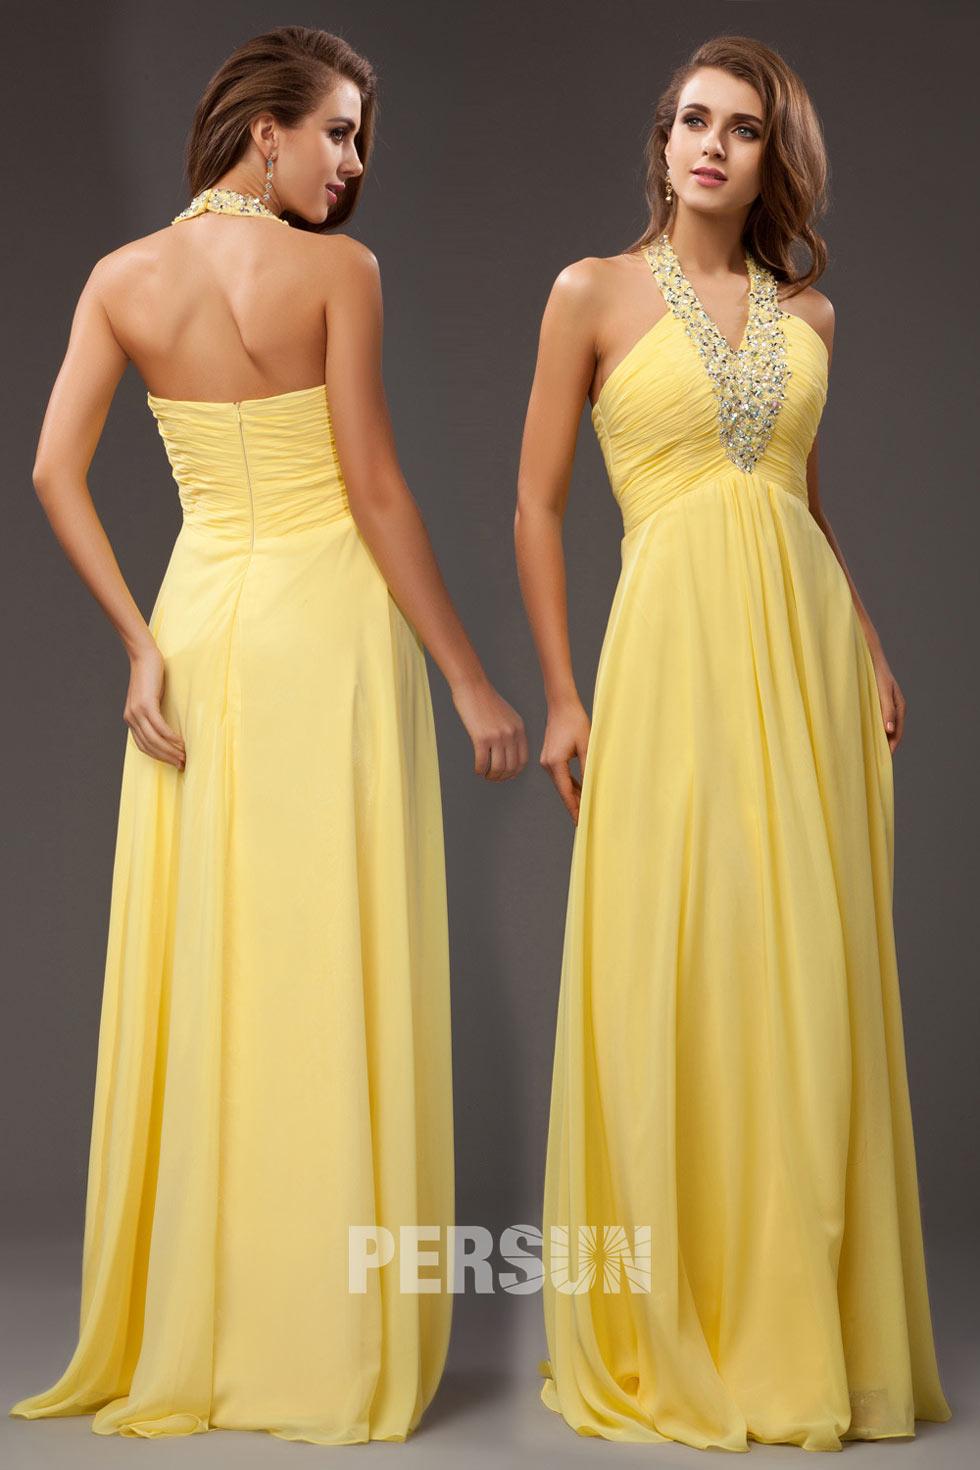 robe de soirée longue jaune empire col halter embelli de strass plissé